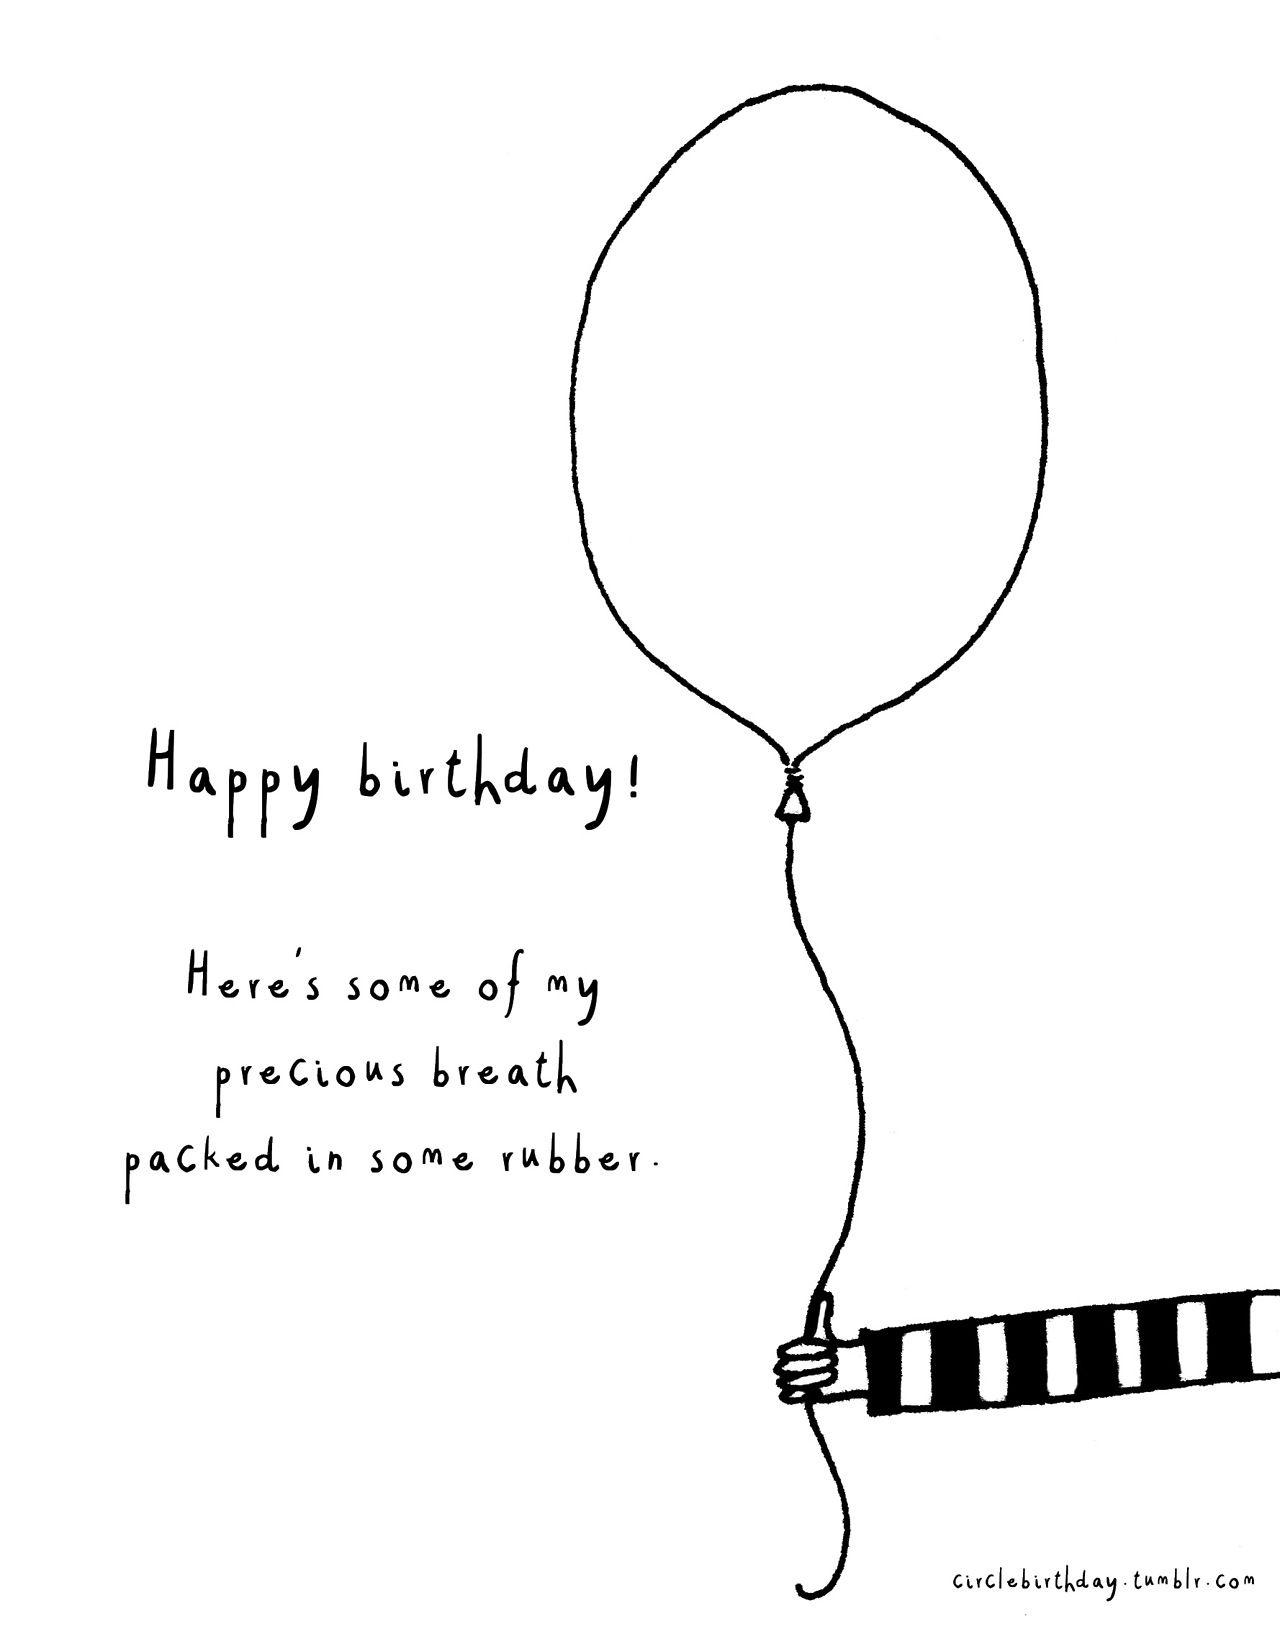 Circle Birthday - Unusual Drawings: Photo | Happy birthday ...